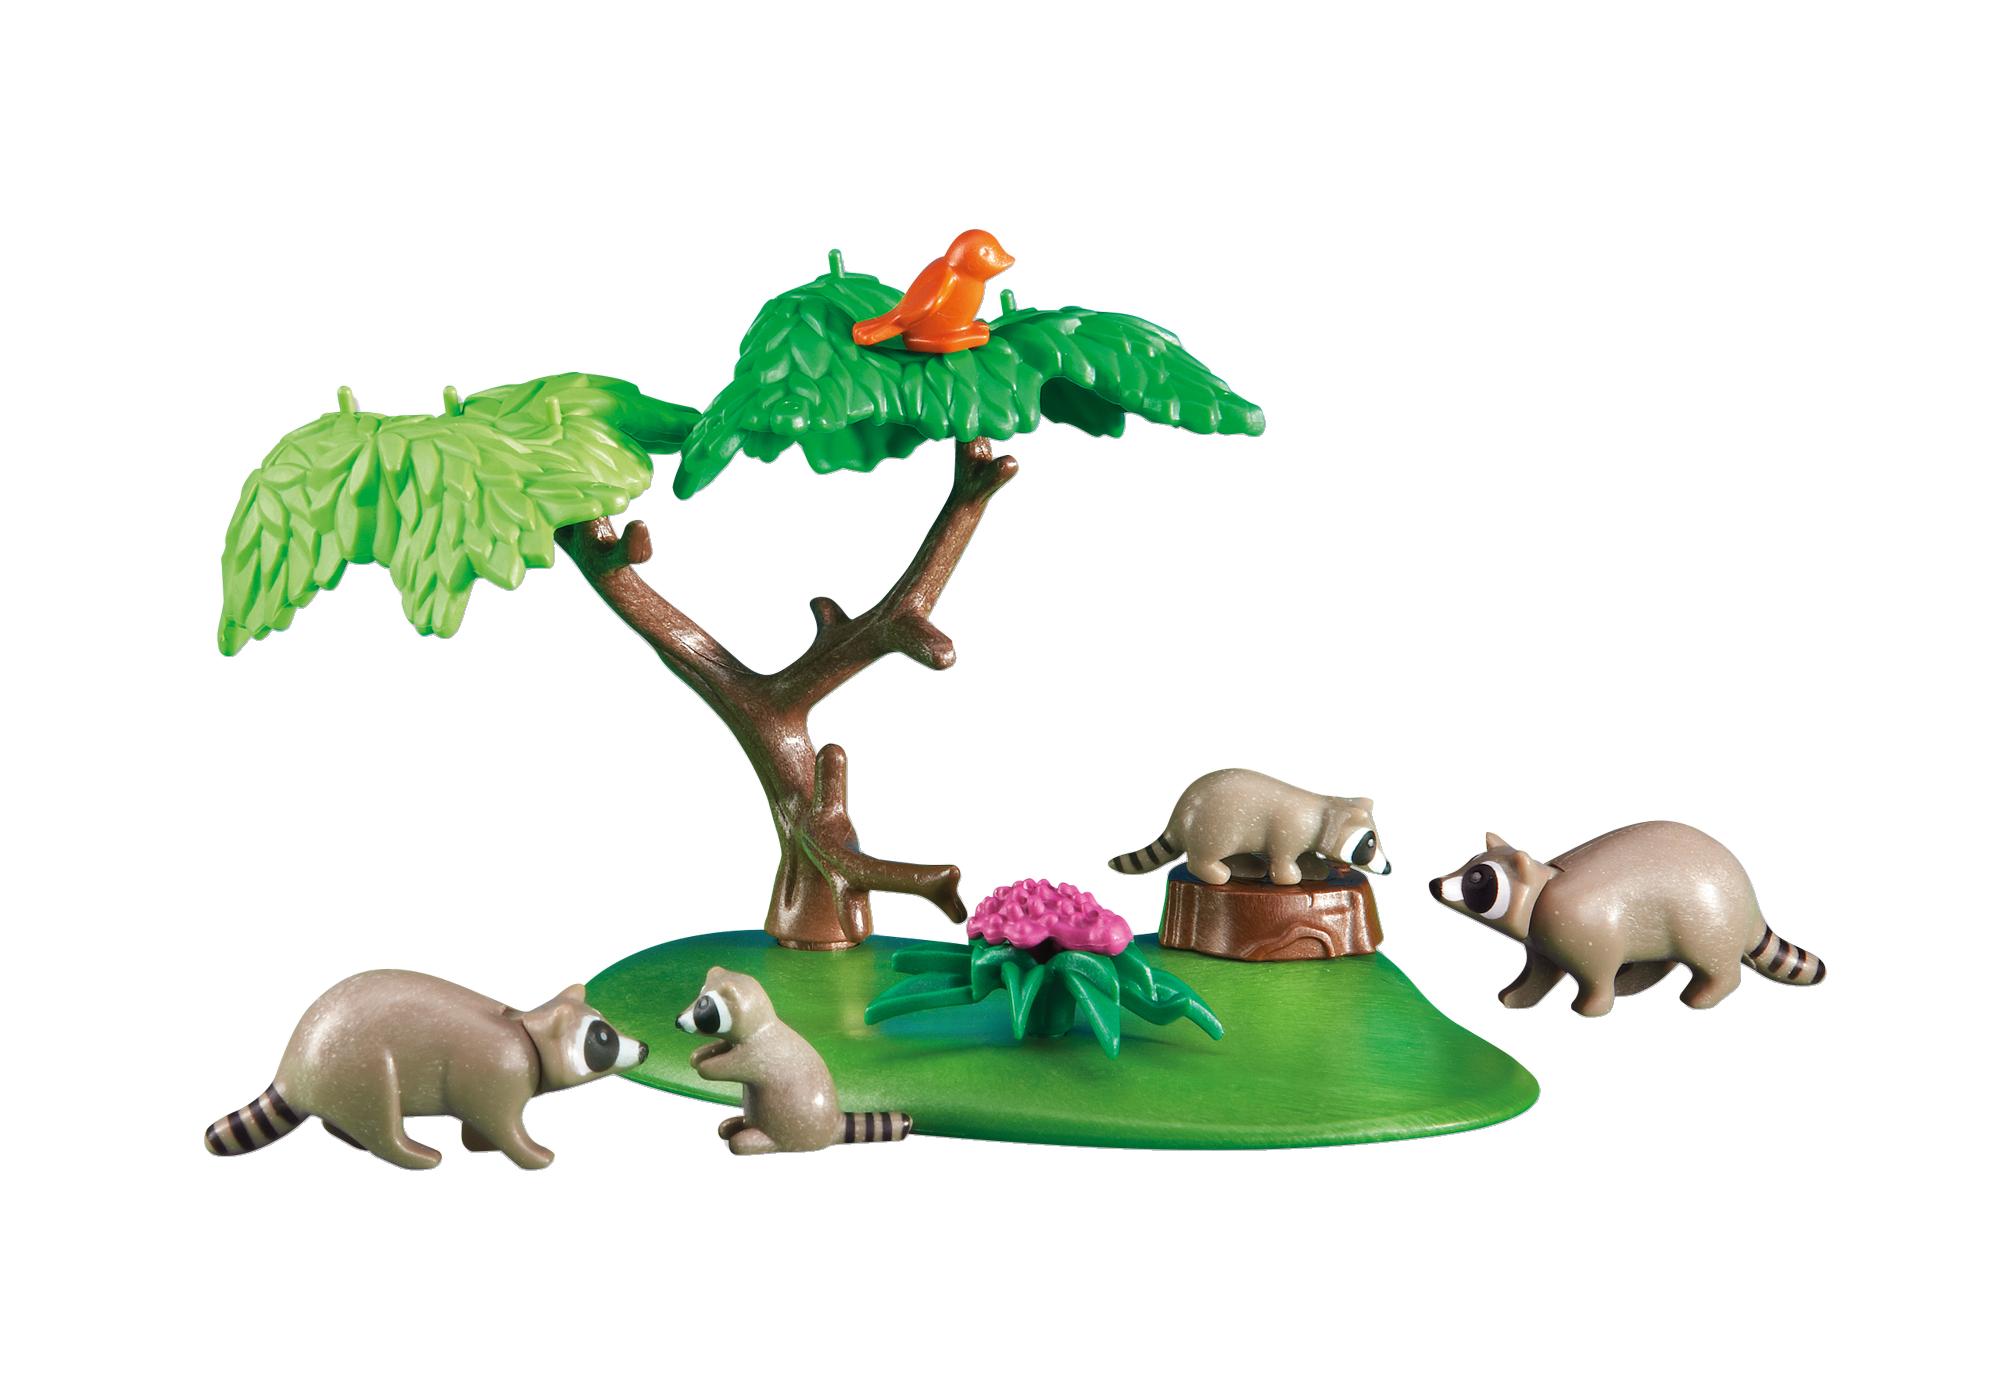 http://media.playmobil.com/i/playmobil/6317_product_detail/Famille de ratons laveurs avec arbre